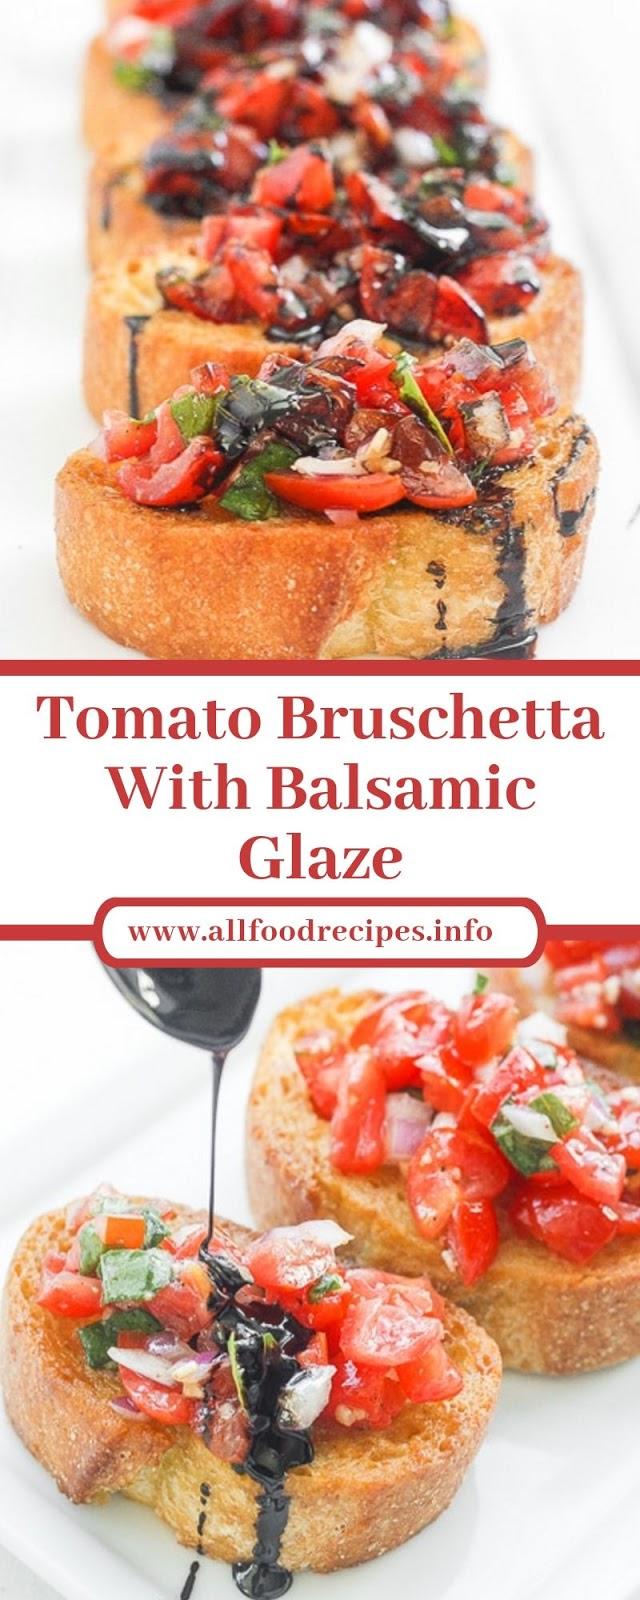 Tomato Bruschetta With Balsamic Glaze